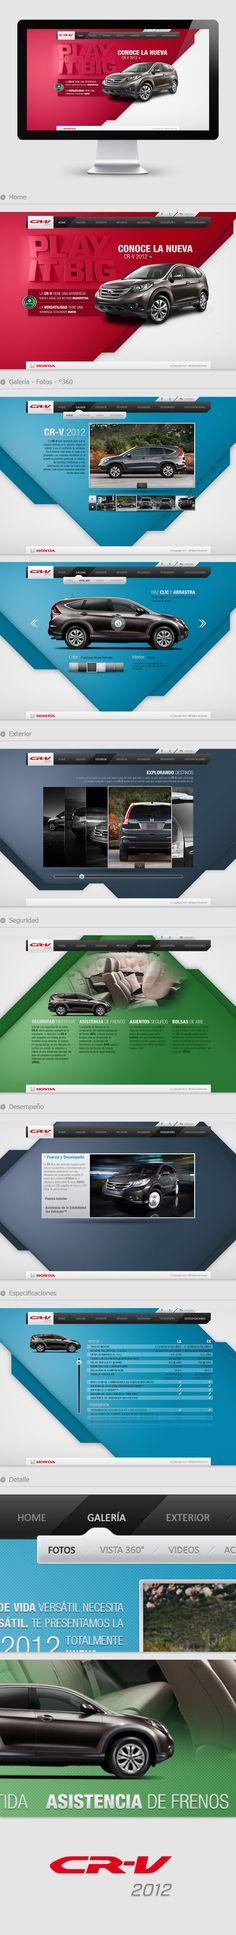 CR - V 2012 - Honda by Israel Trujillo, via Behance. If you like UX, design, or design thinking, check out theuxblog.com